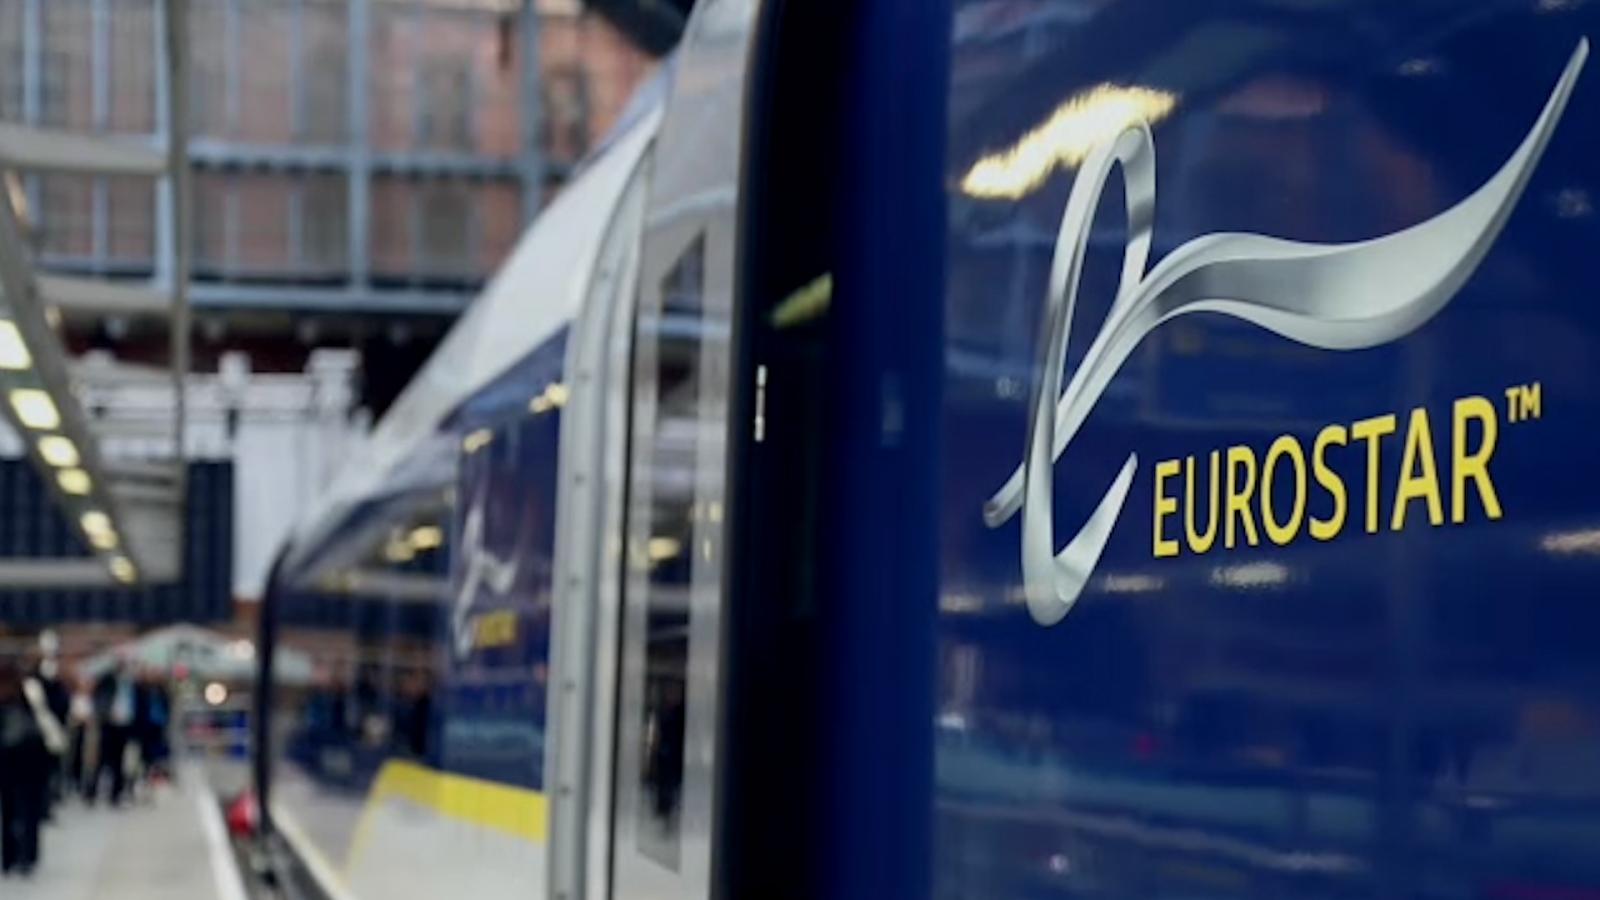 Eurostar strike over work-life dispute